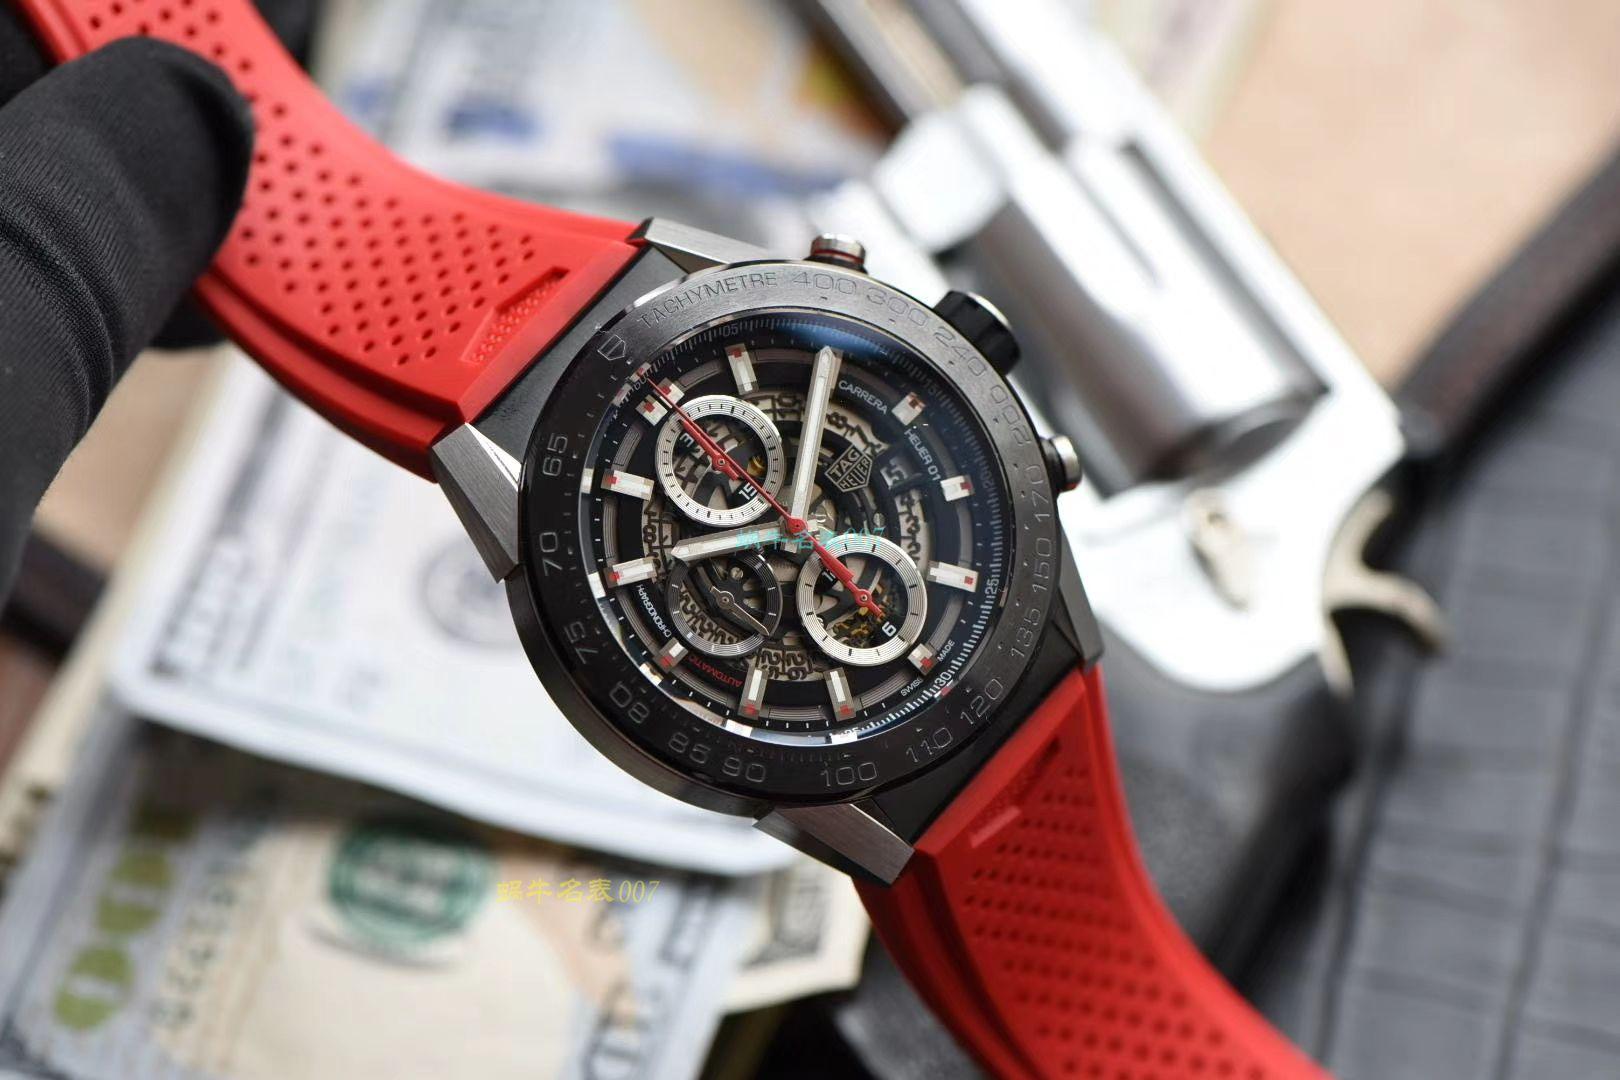 XF厂超A高仿手表泰格豪雅卡莱拉系列CAR2A1Z.FT6050腕表 / TG092